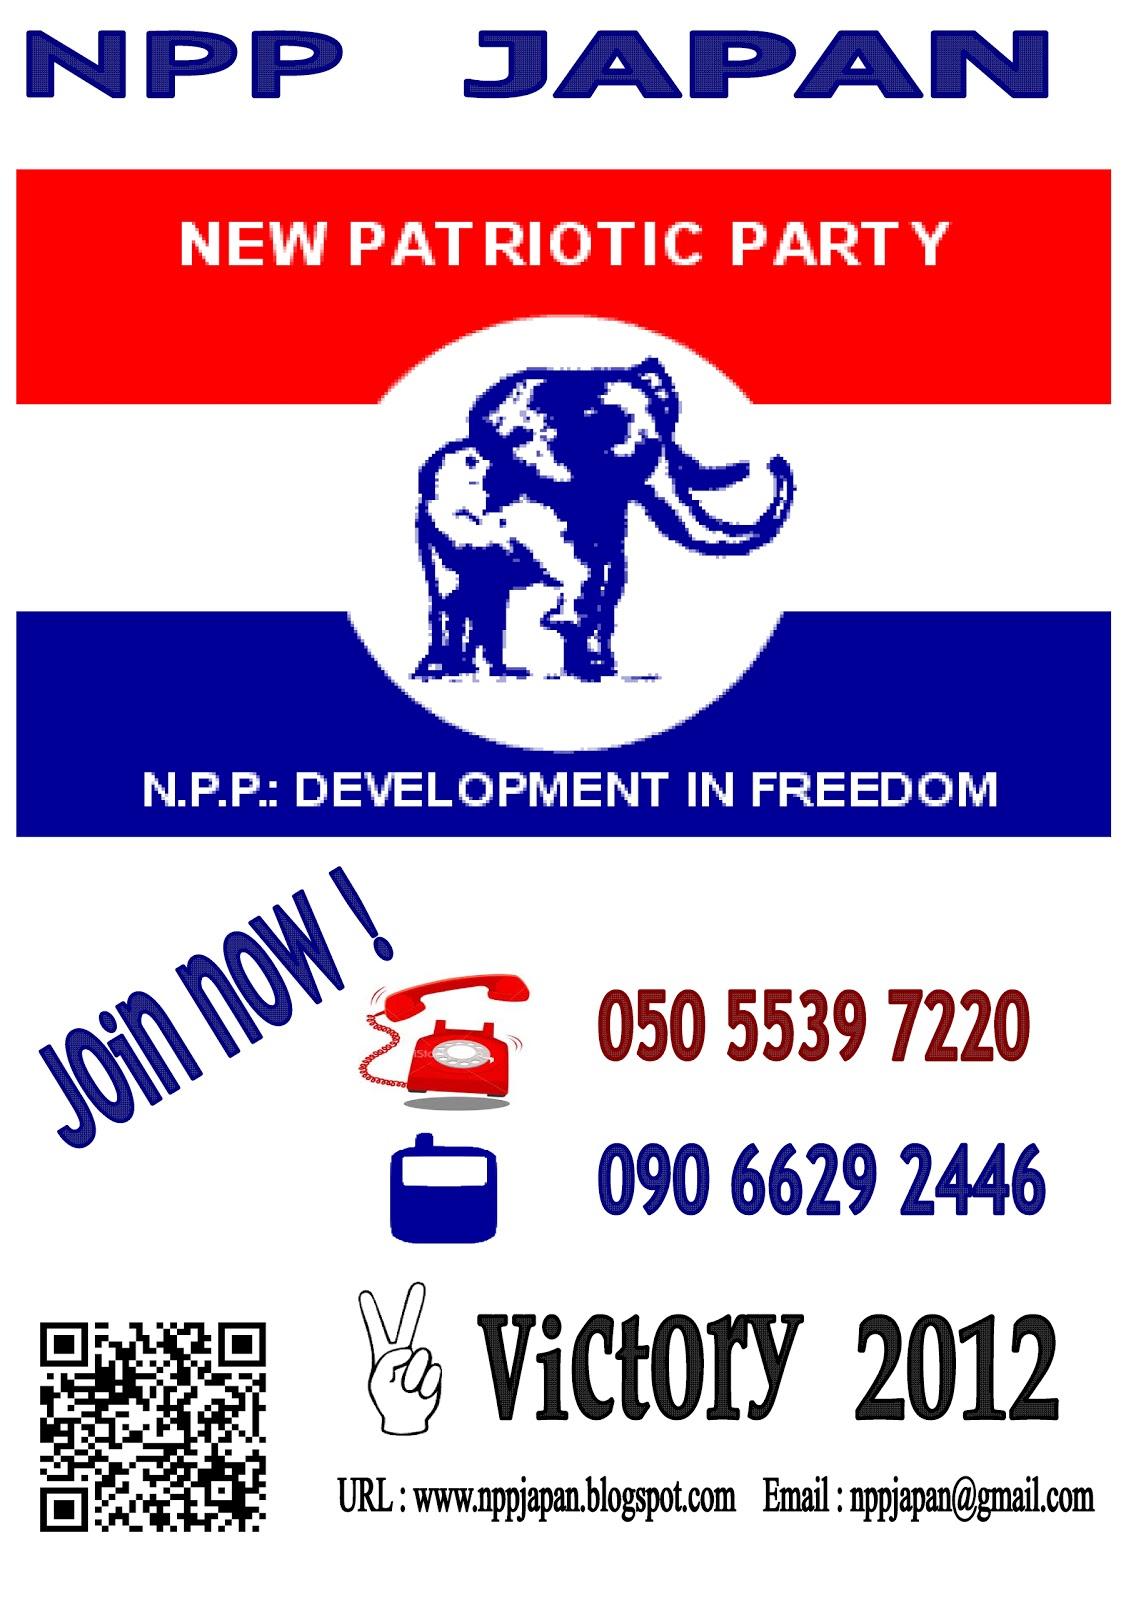 New Patriotic Party (NPP JAPAN ): Kit